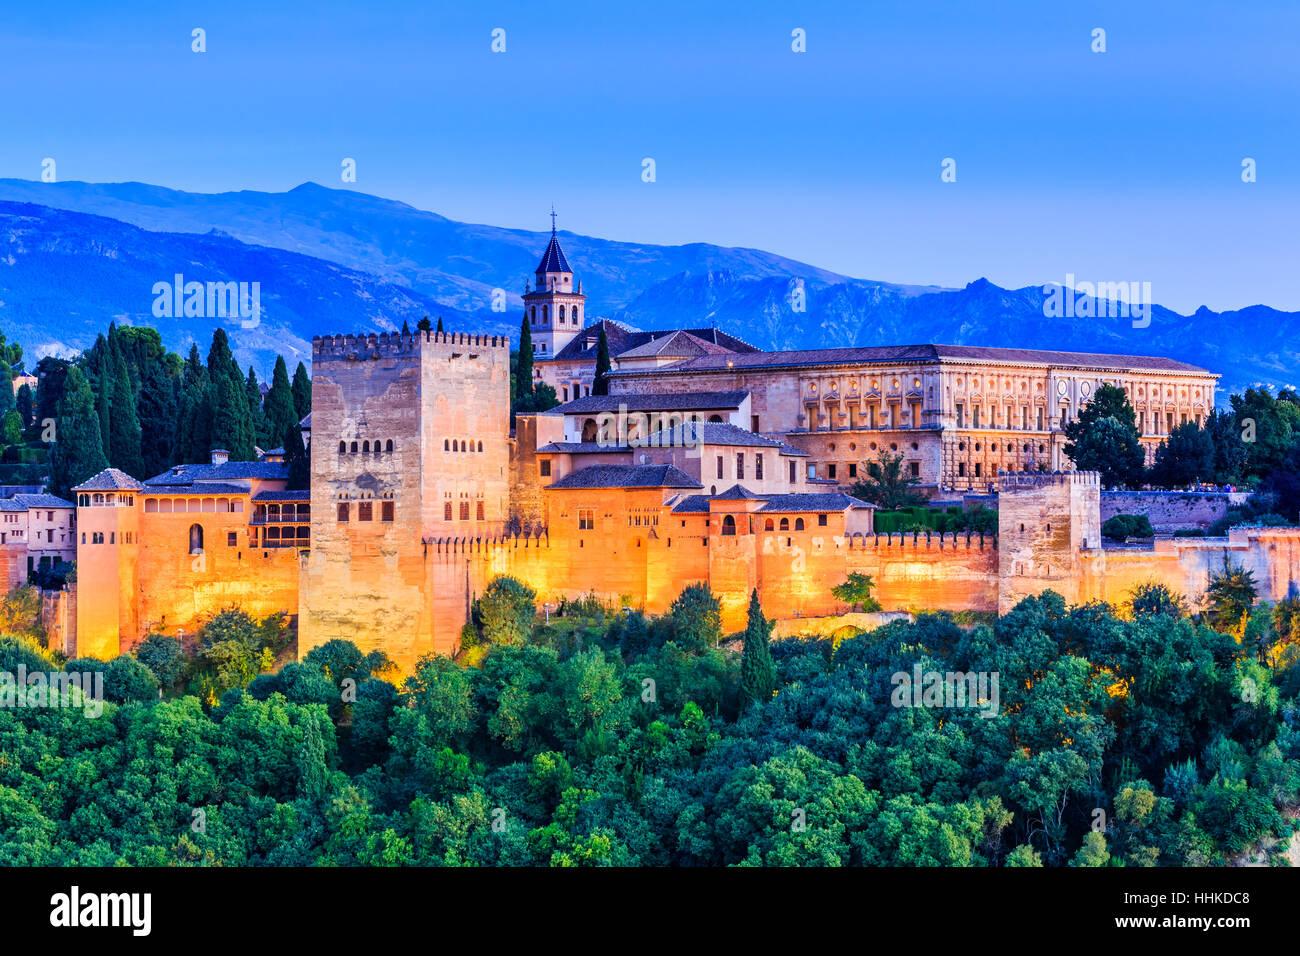 Alhambra von Granada, Spanien. Stockbild